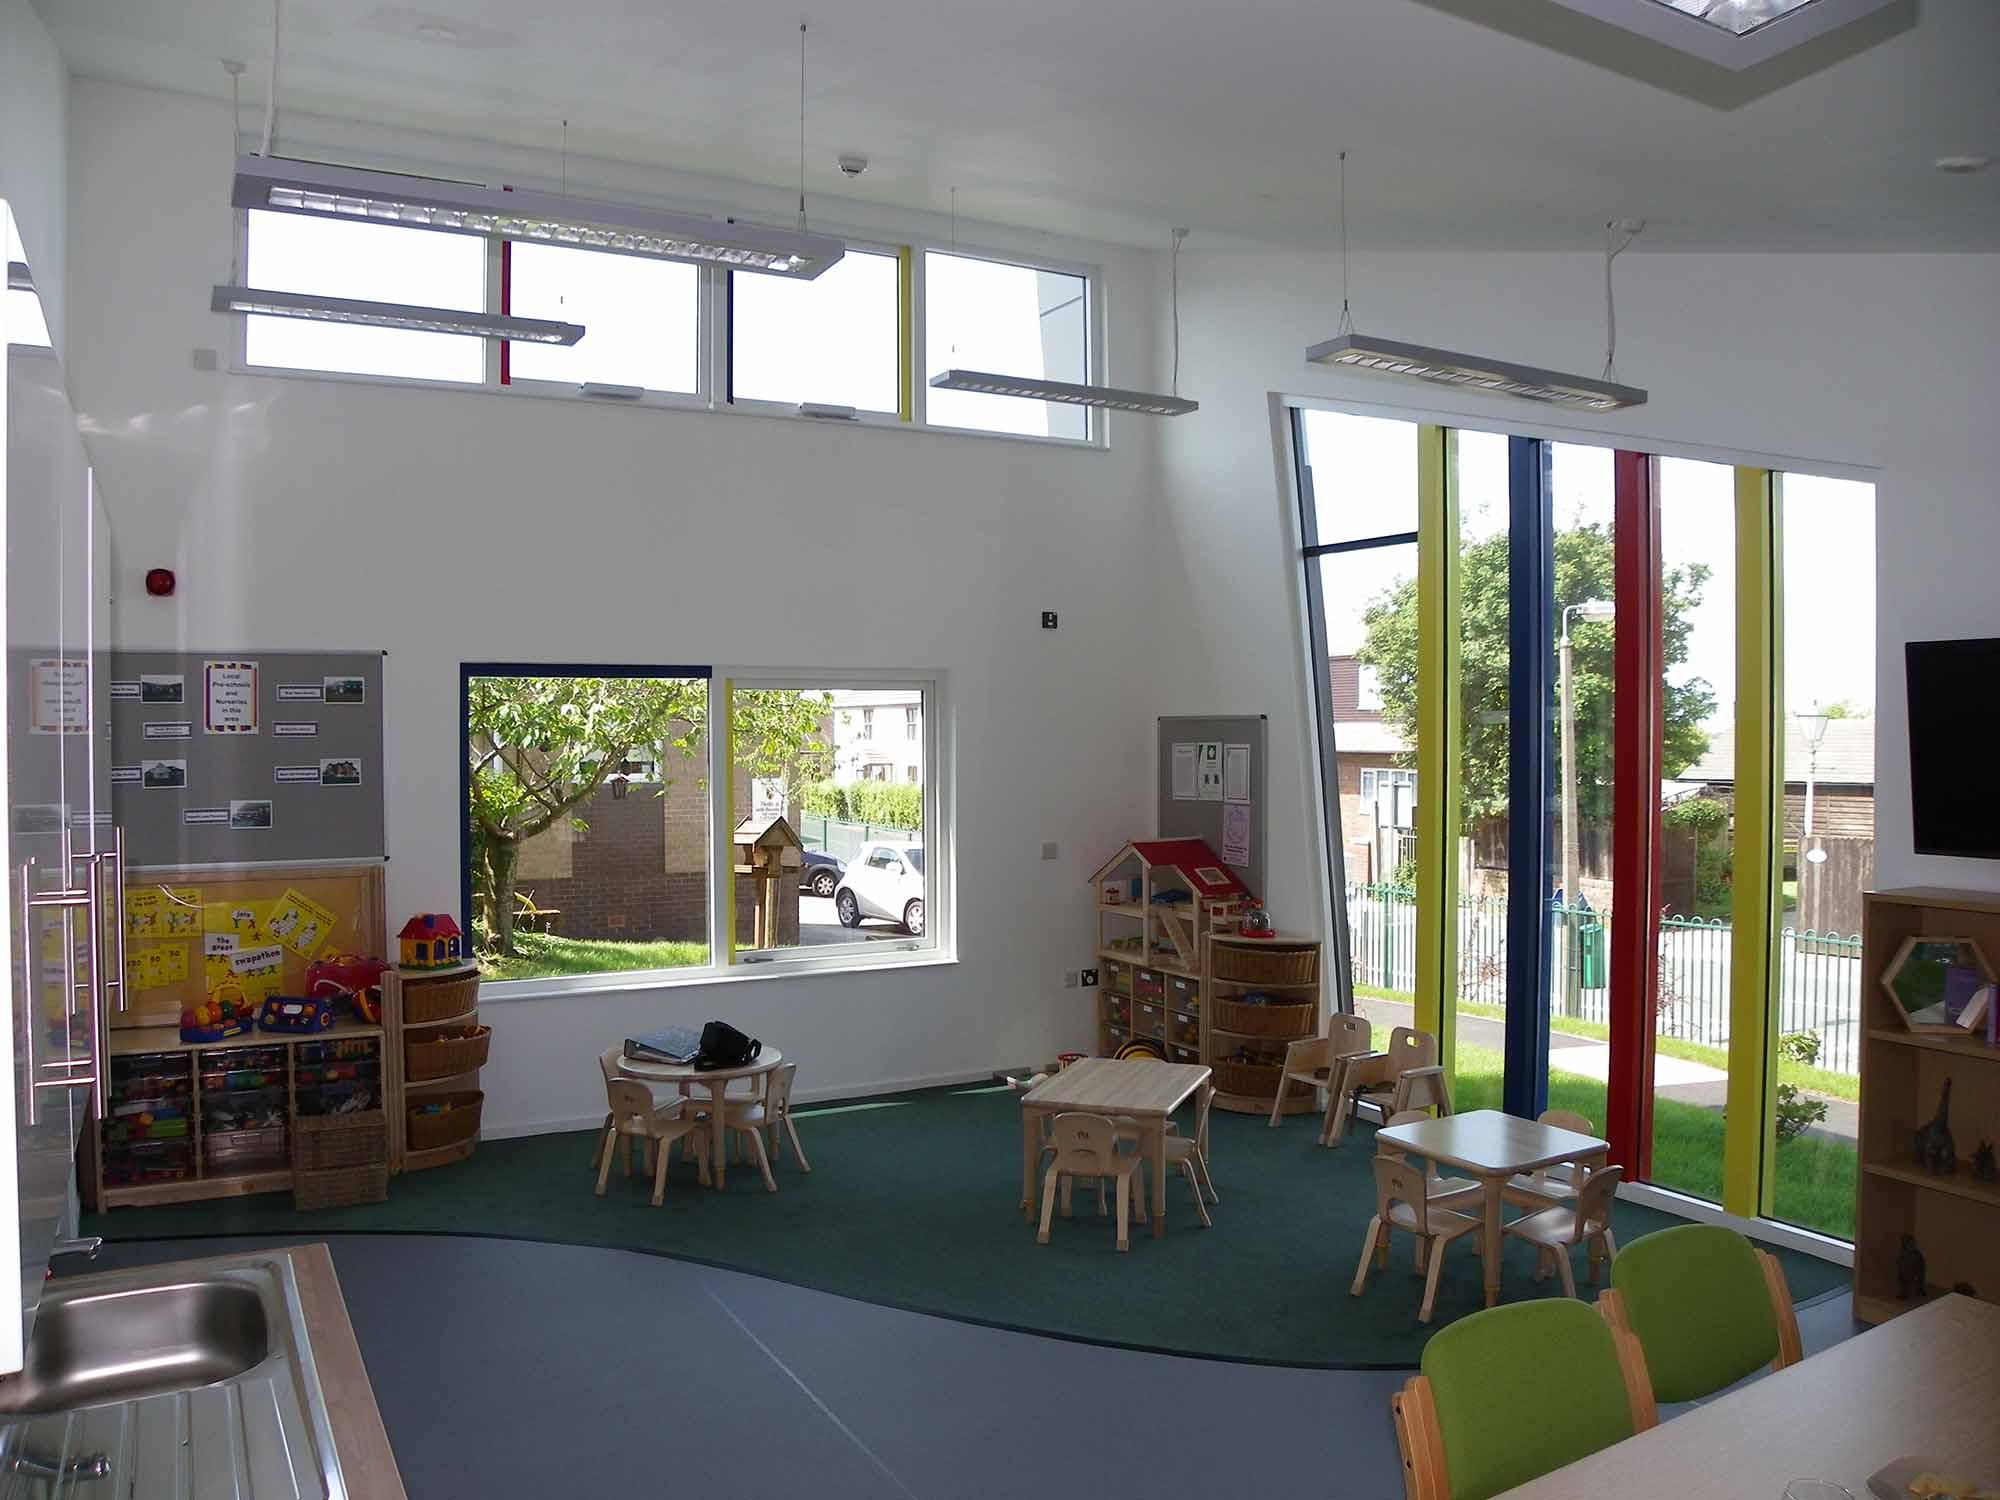 Hesketh Bank Childrens Centre